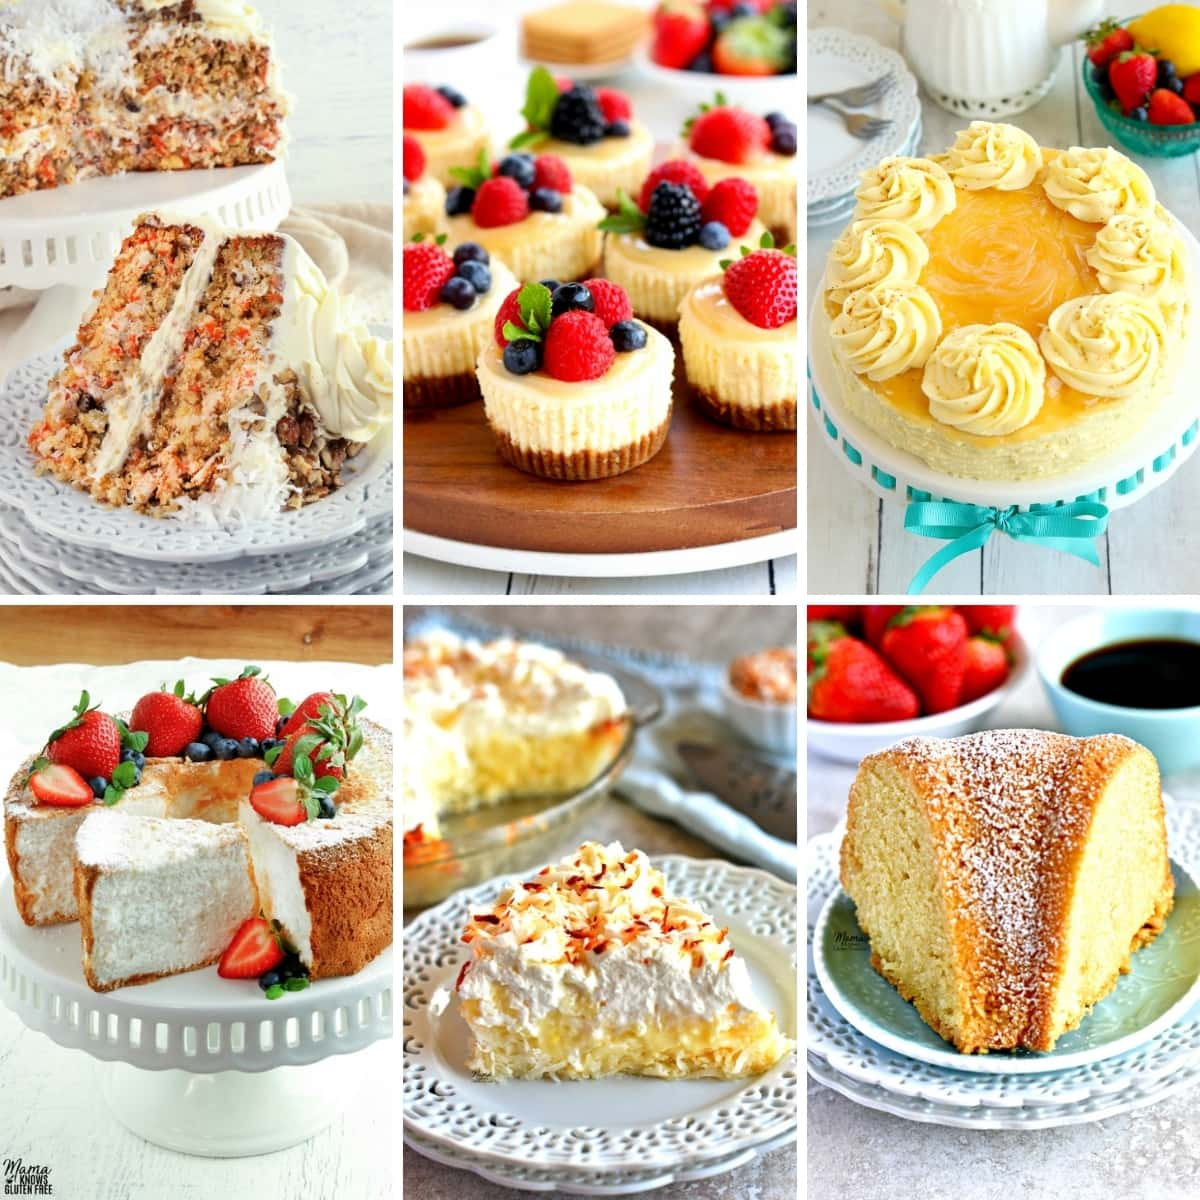 gluten-free Easter dessert recipes photo collage